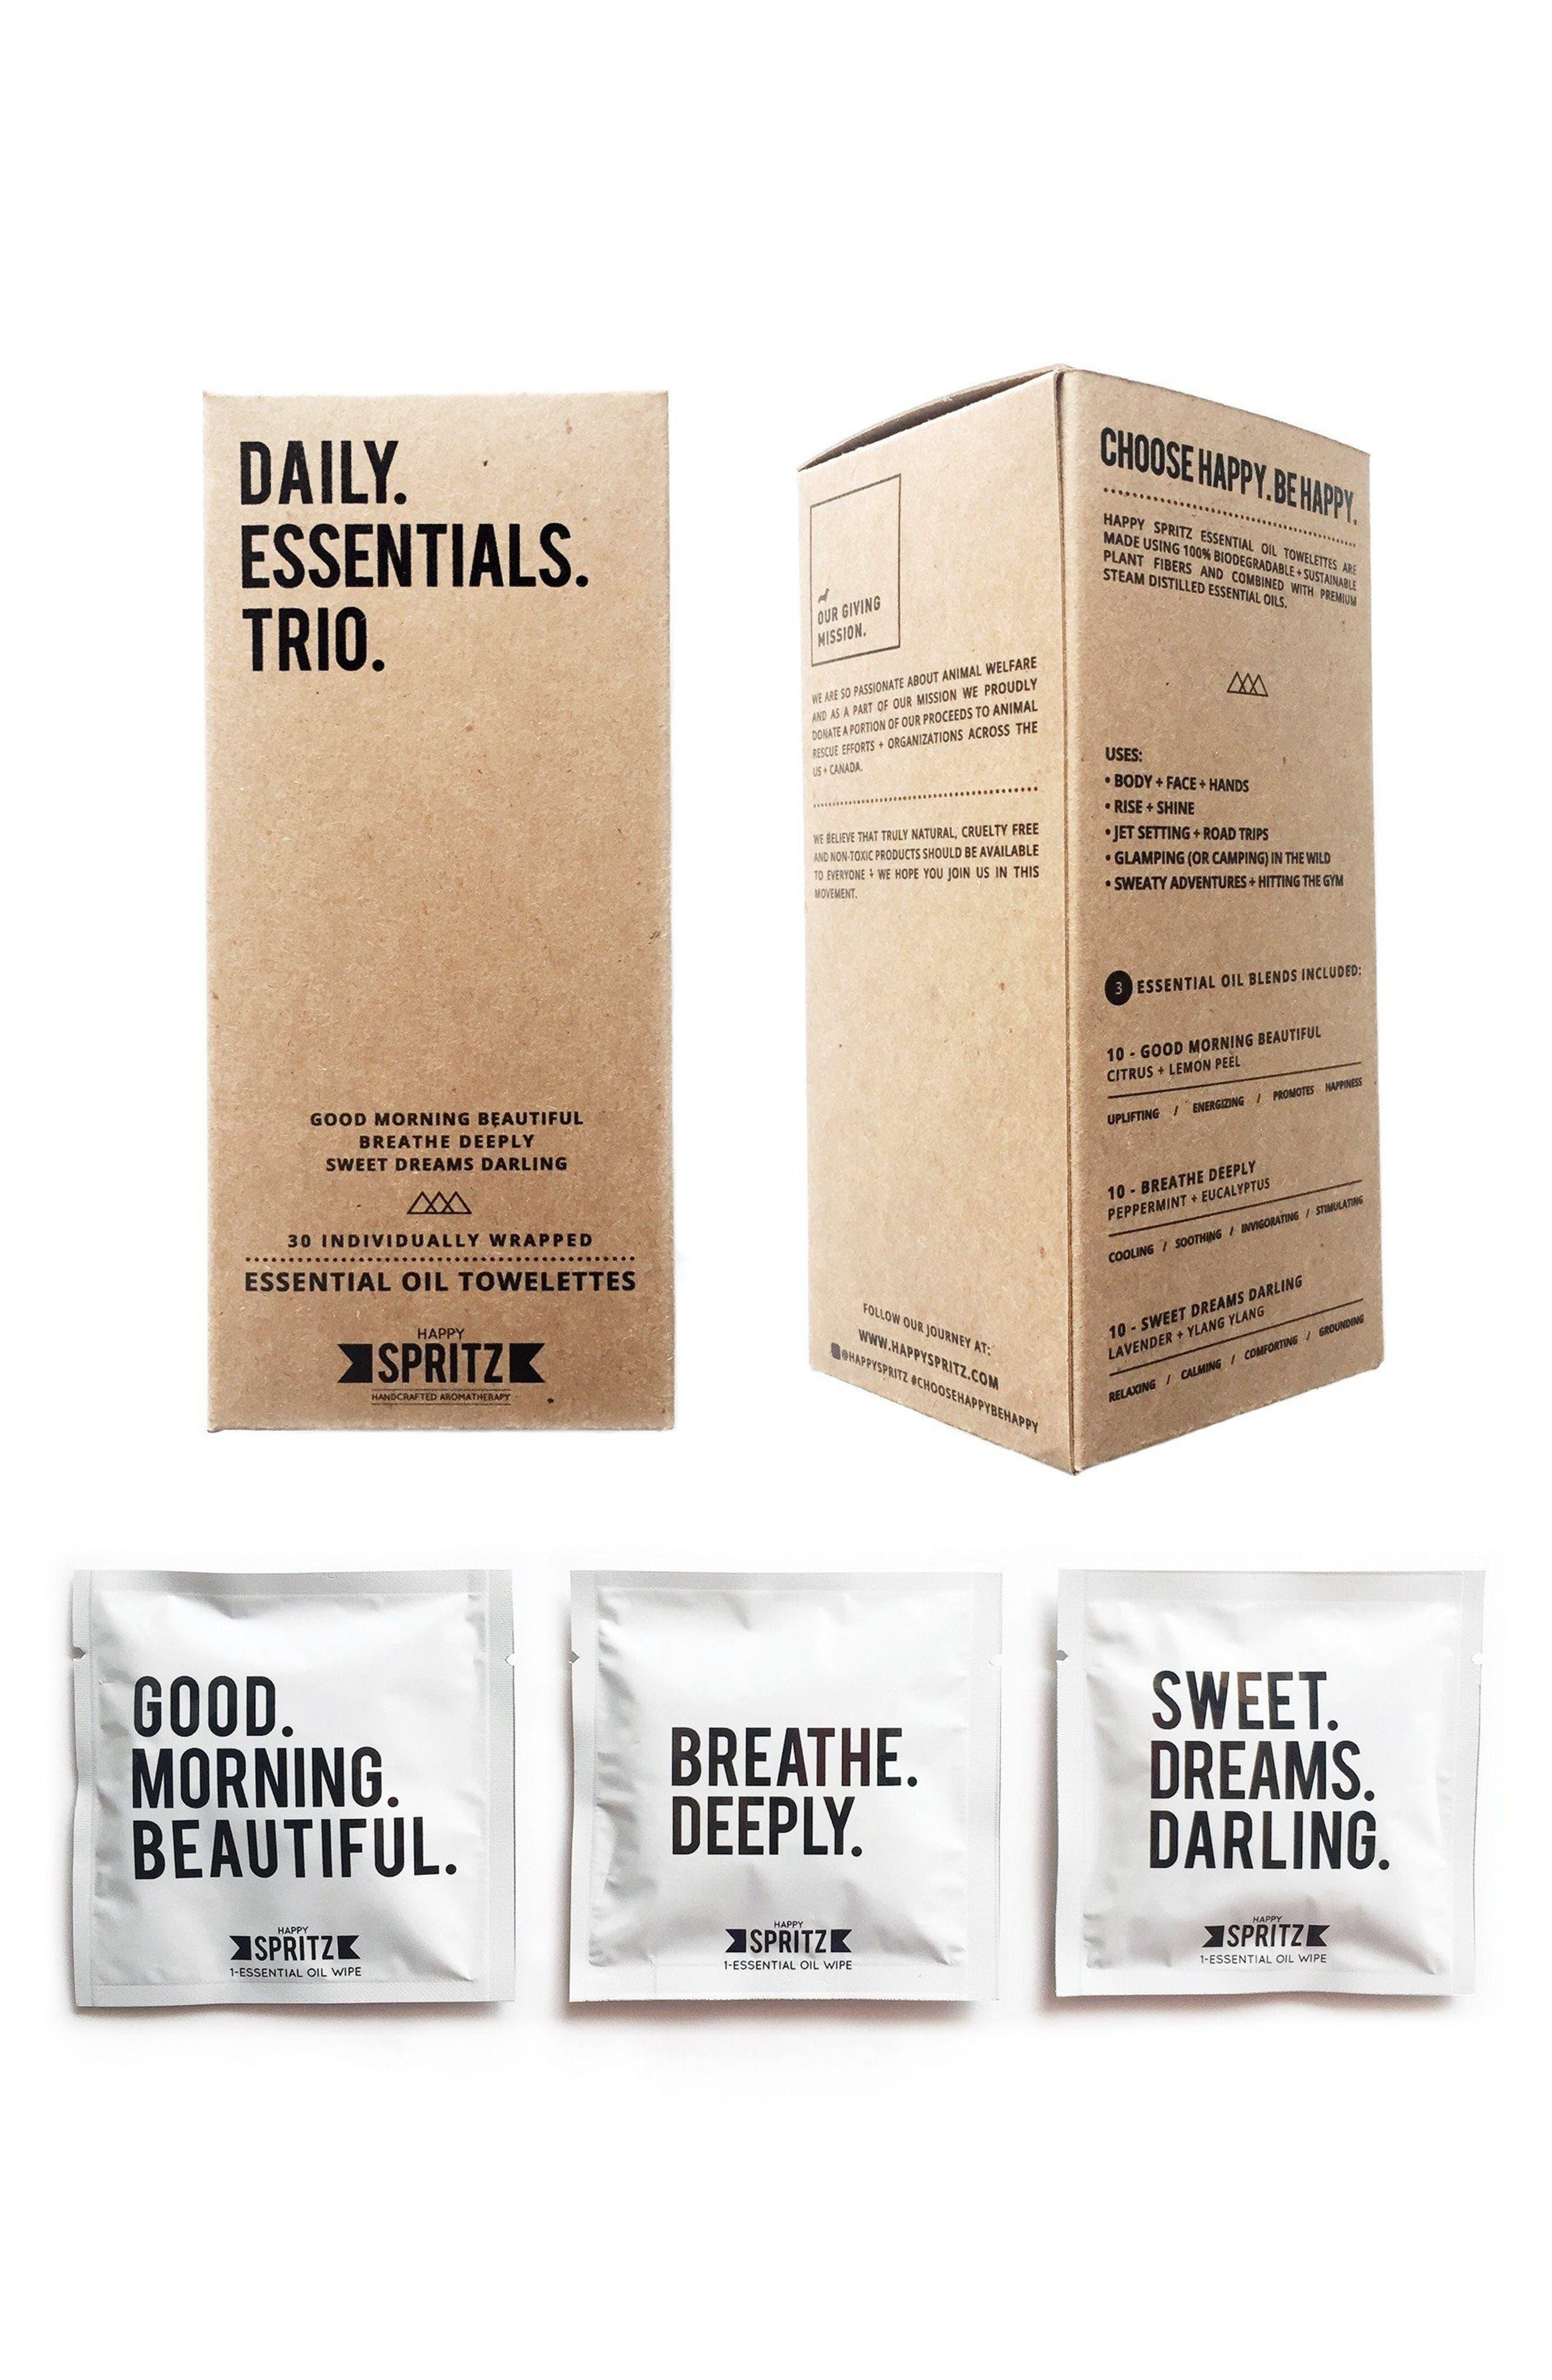 30-Day Daily Essentials Trio